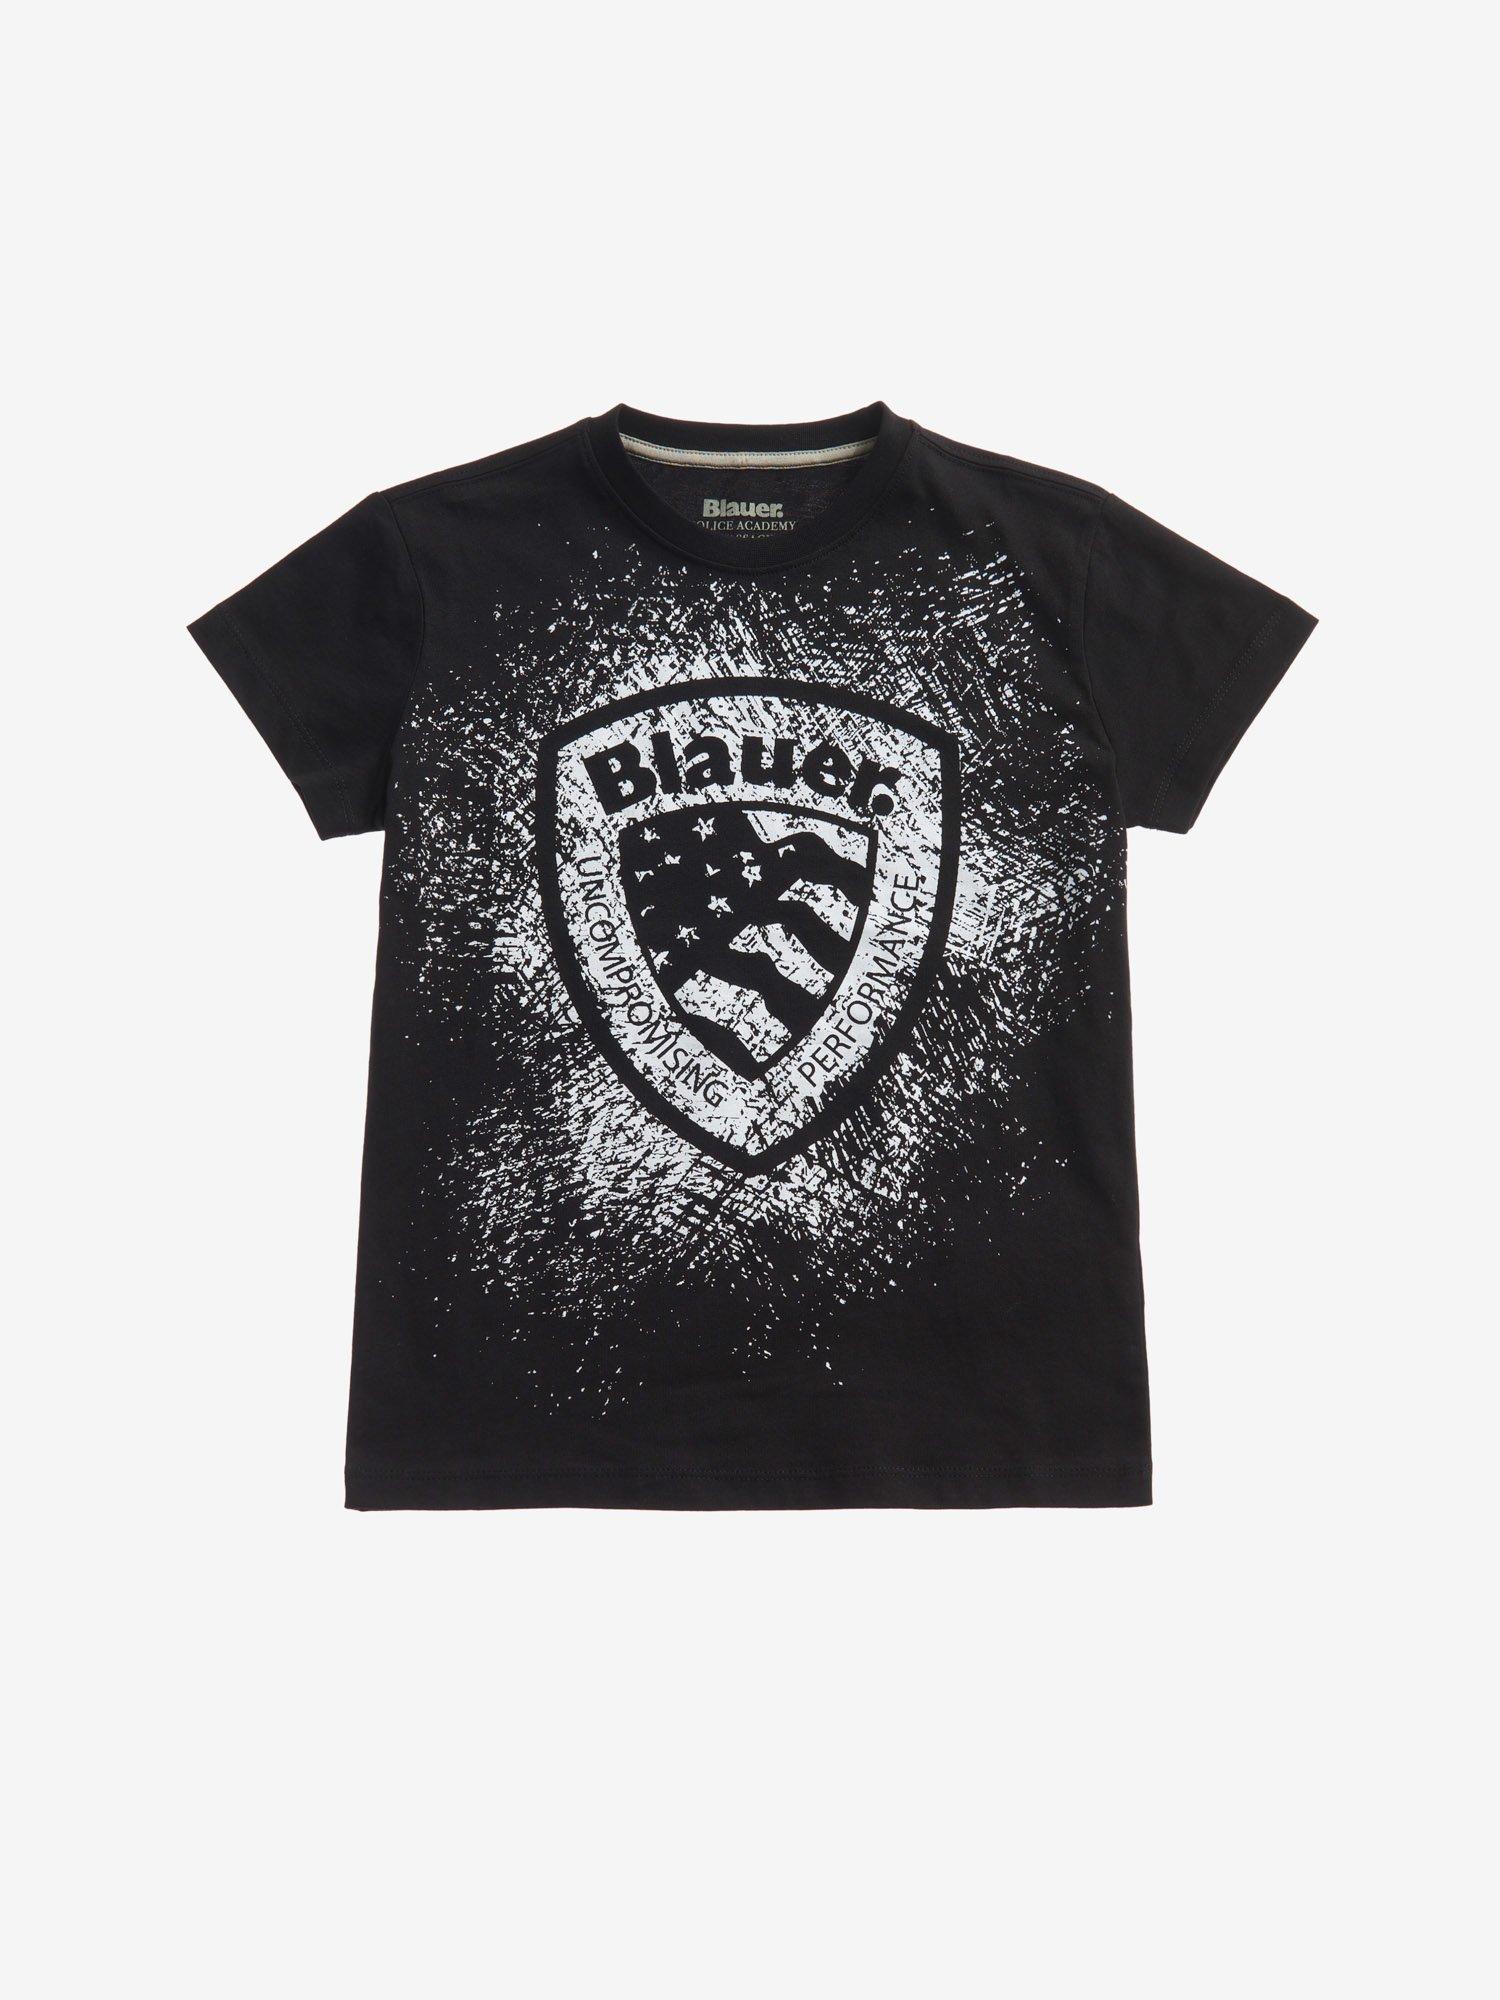 Blauer - T-SHIRT POUR GARÇON ÉCUSSON BLAUER - Noir - Blauer